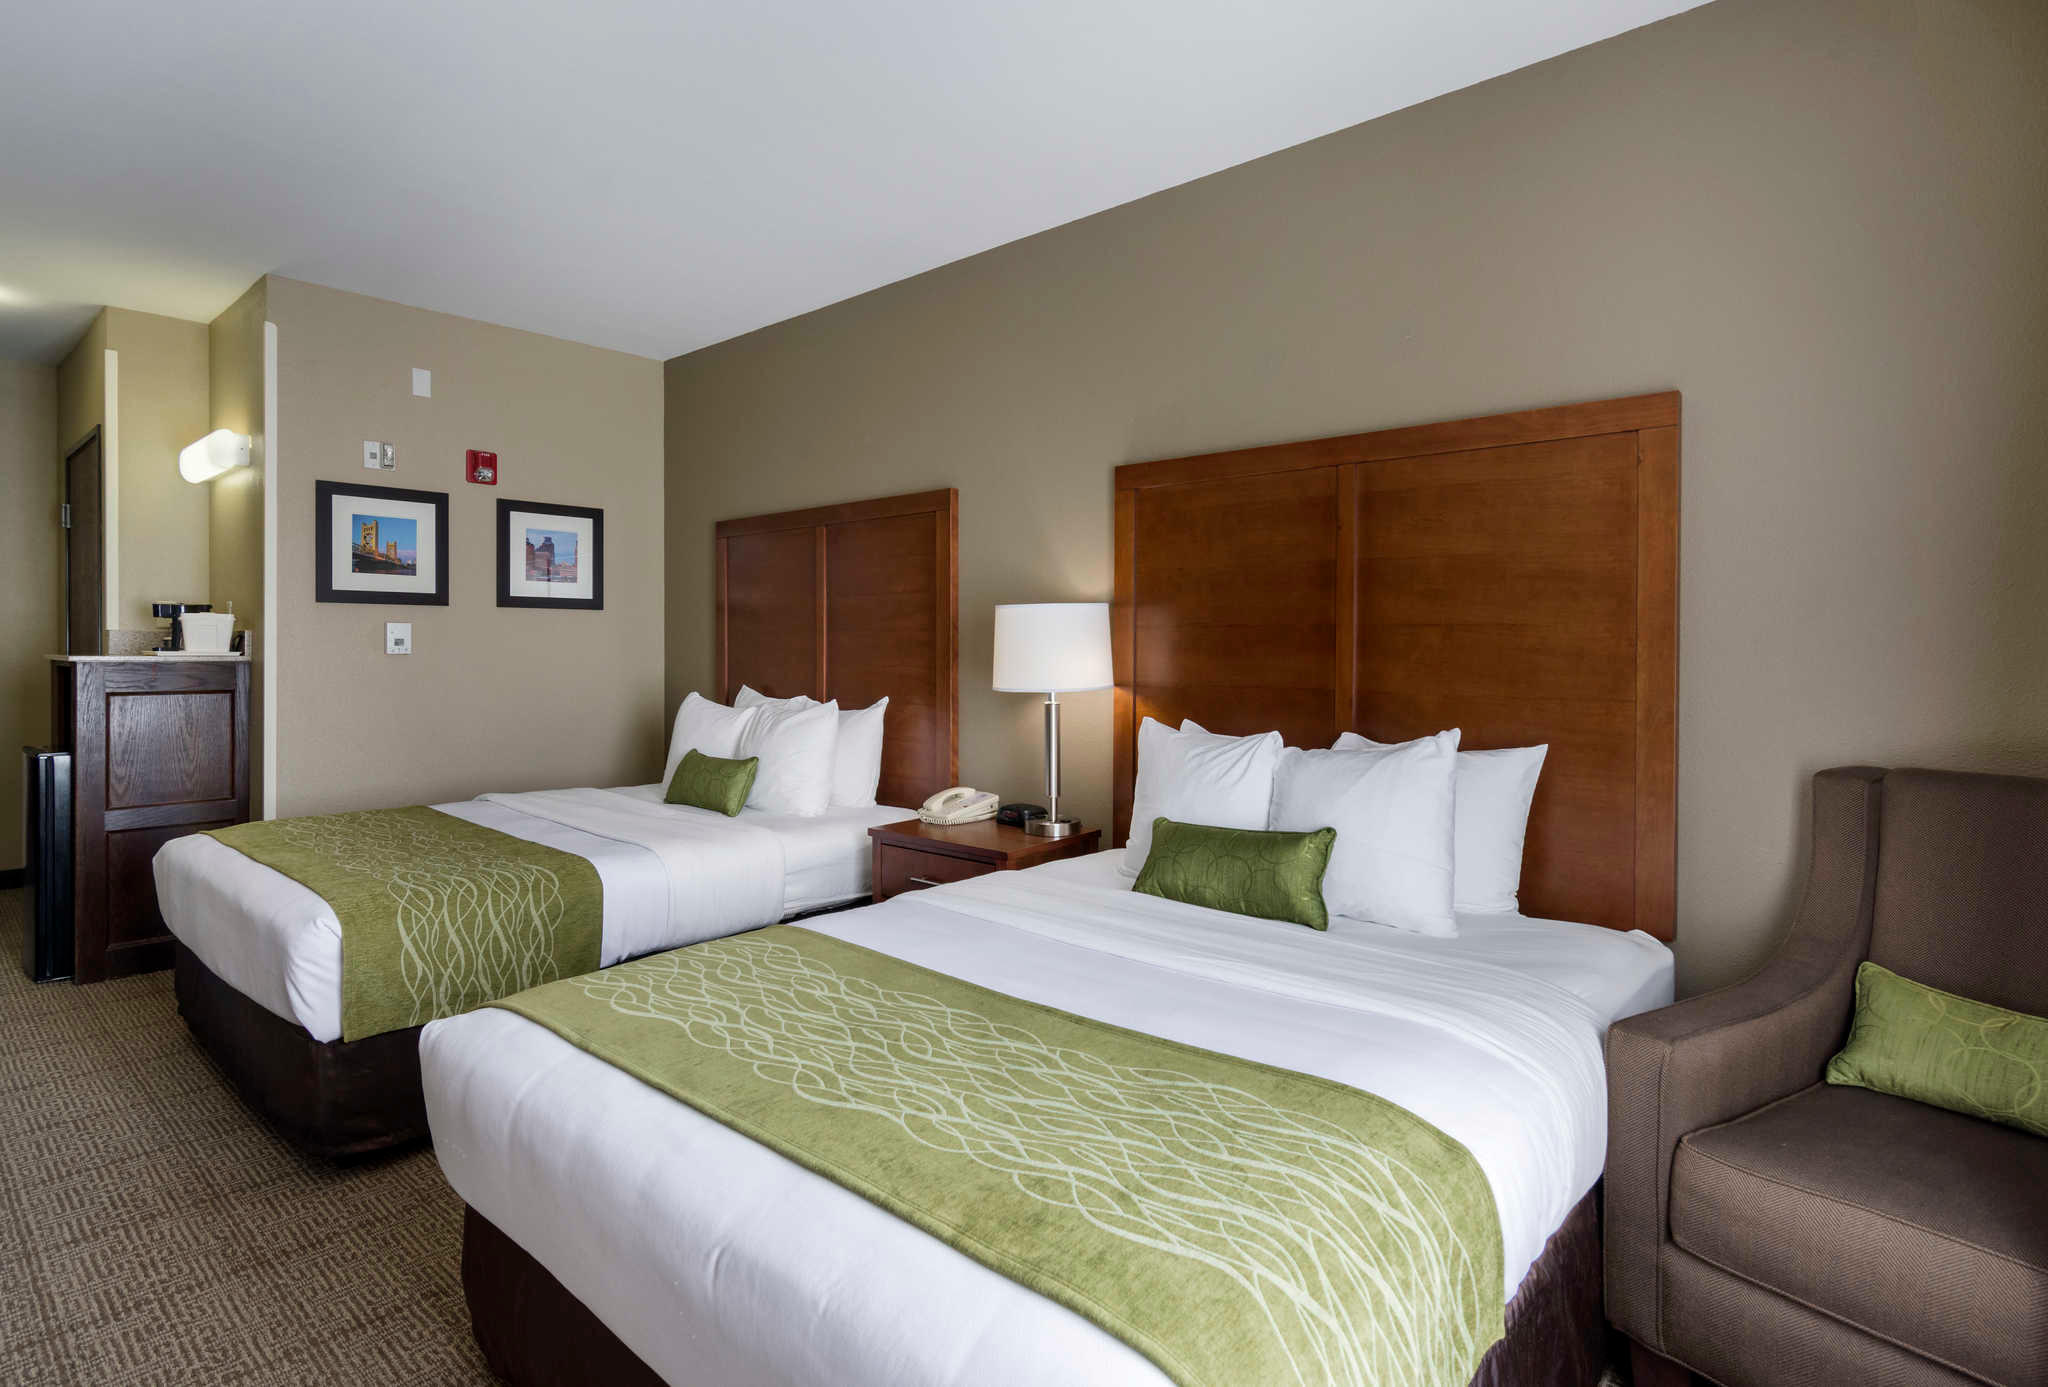 Comfort Inn & Suites Sacramento - University Area image 14